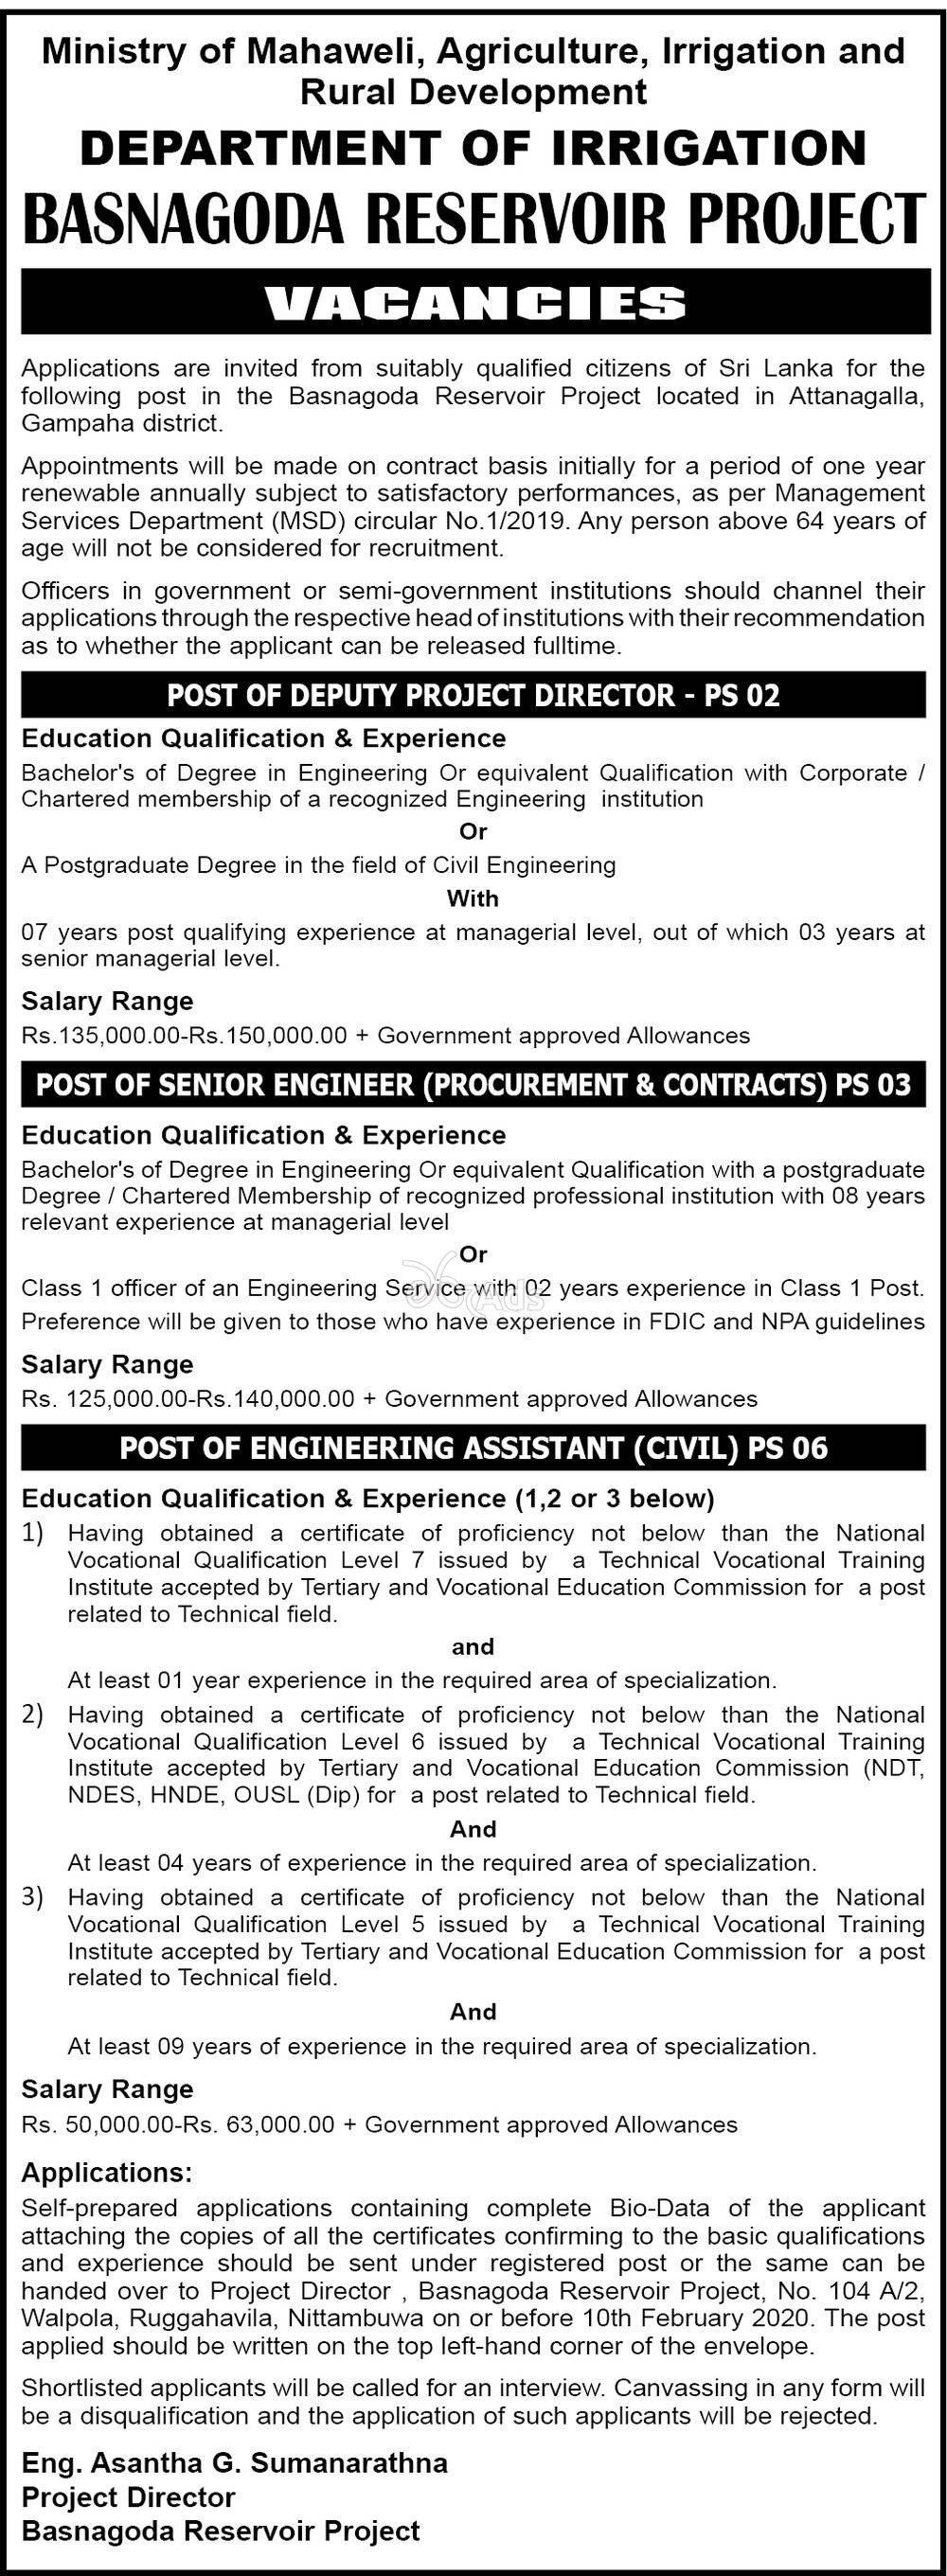 Deputy Project Director, Senior Engineer, Engineering Assistant - Department of Irrigation